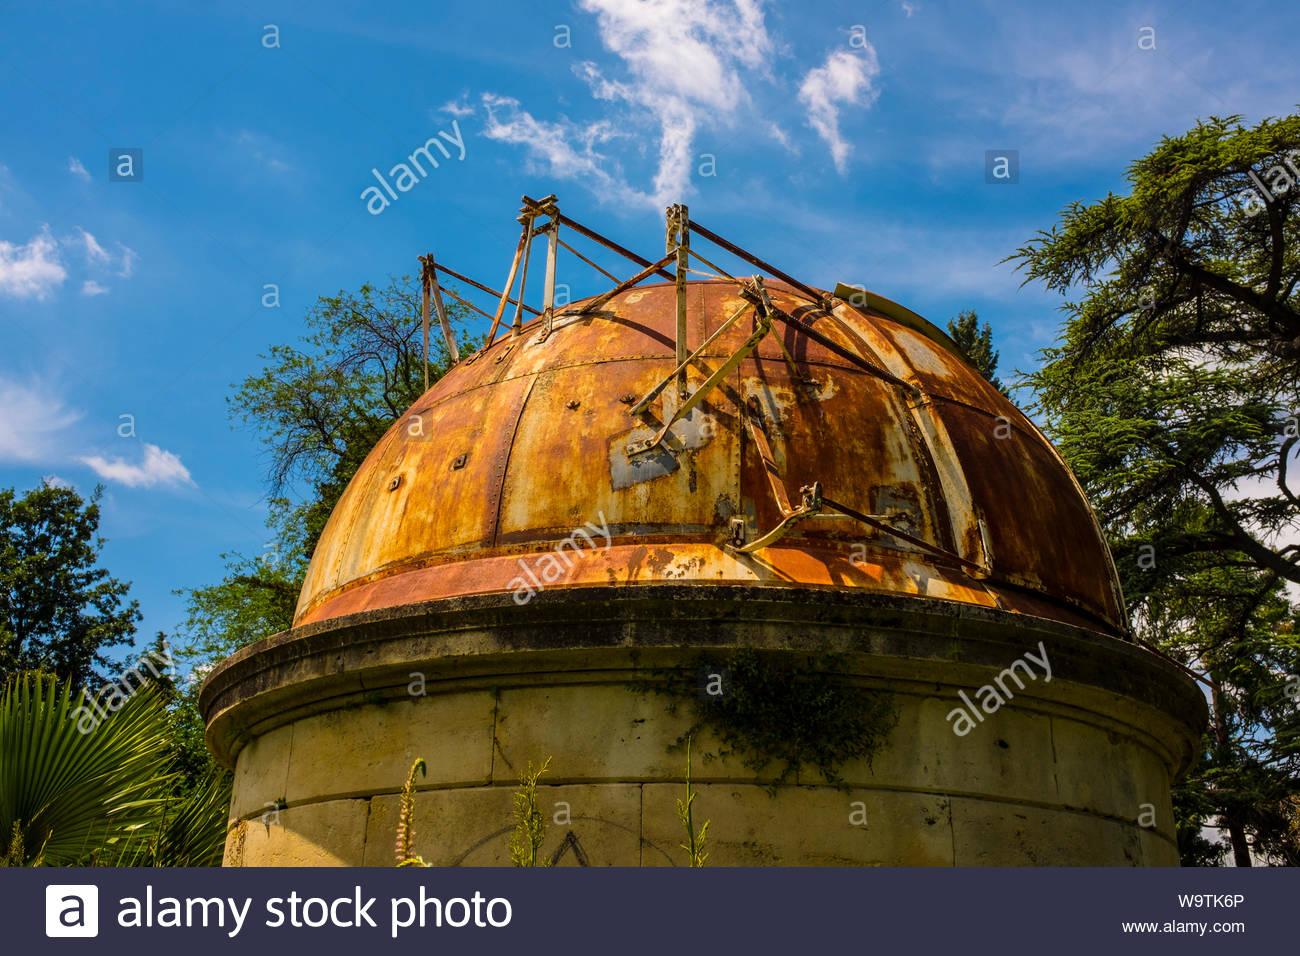 astronomy observatory observatoire astronomique in jardin des plantes de montpellier botanic gardens montpellier france built at the suggestion W9TK6P